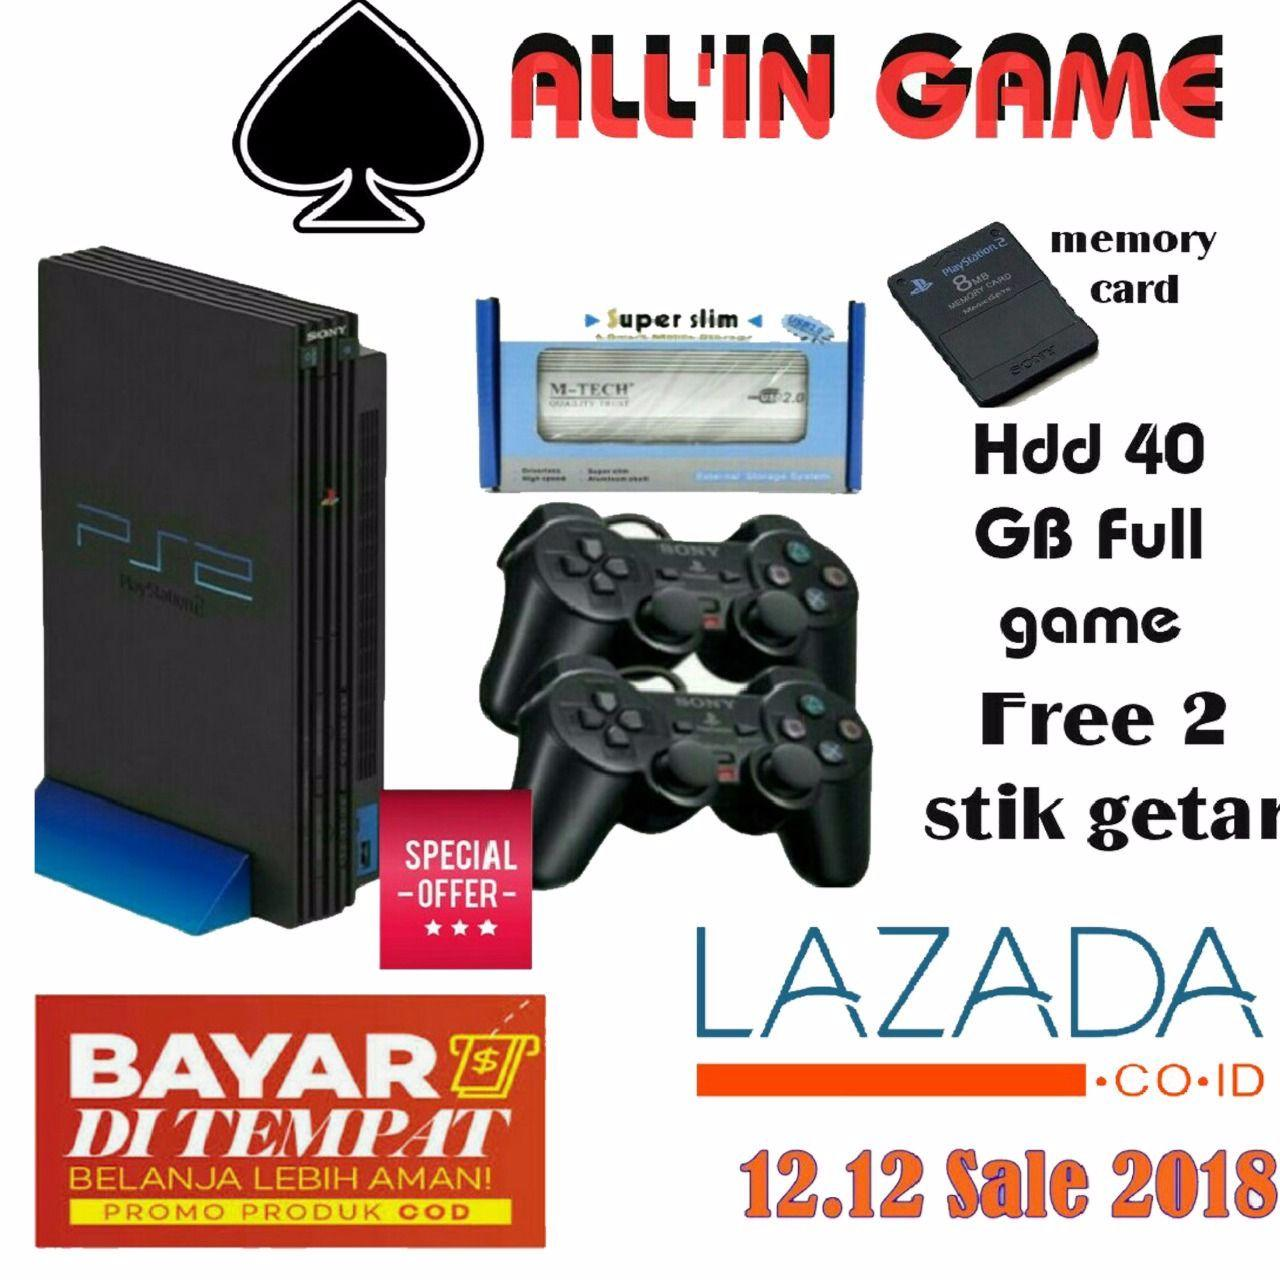 Konsol Playstation Terbaru Sony 4 Slim 500gb Garansi Cuh 2006a Hits Bundle Ps2 Fat Harddisk Isi 50games 2stick Elite